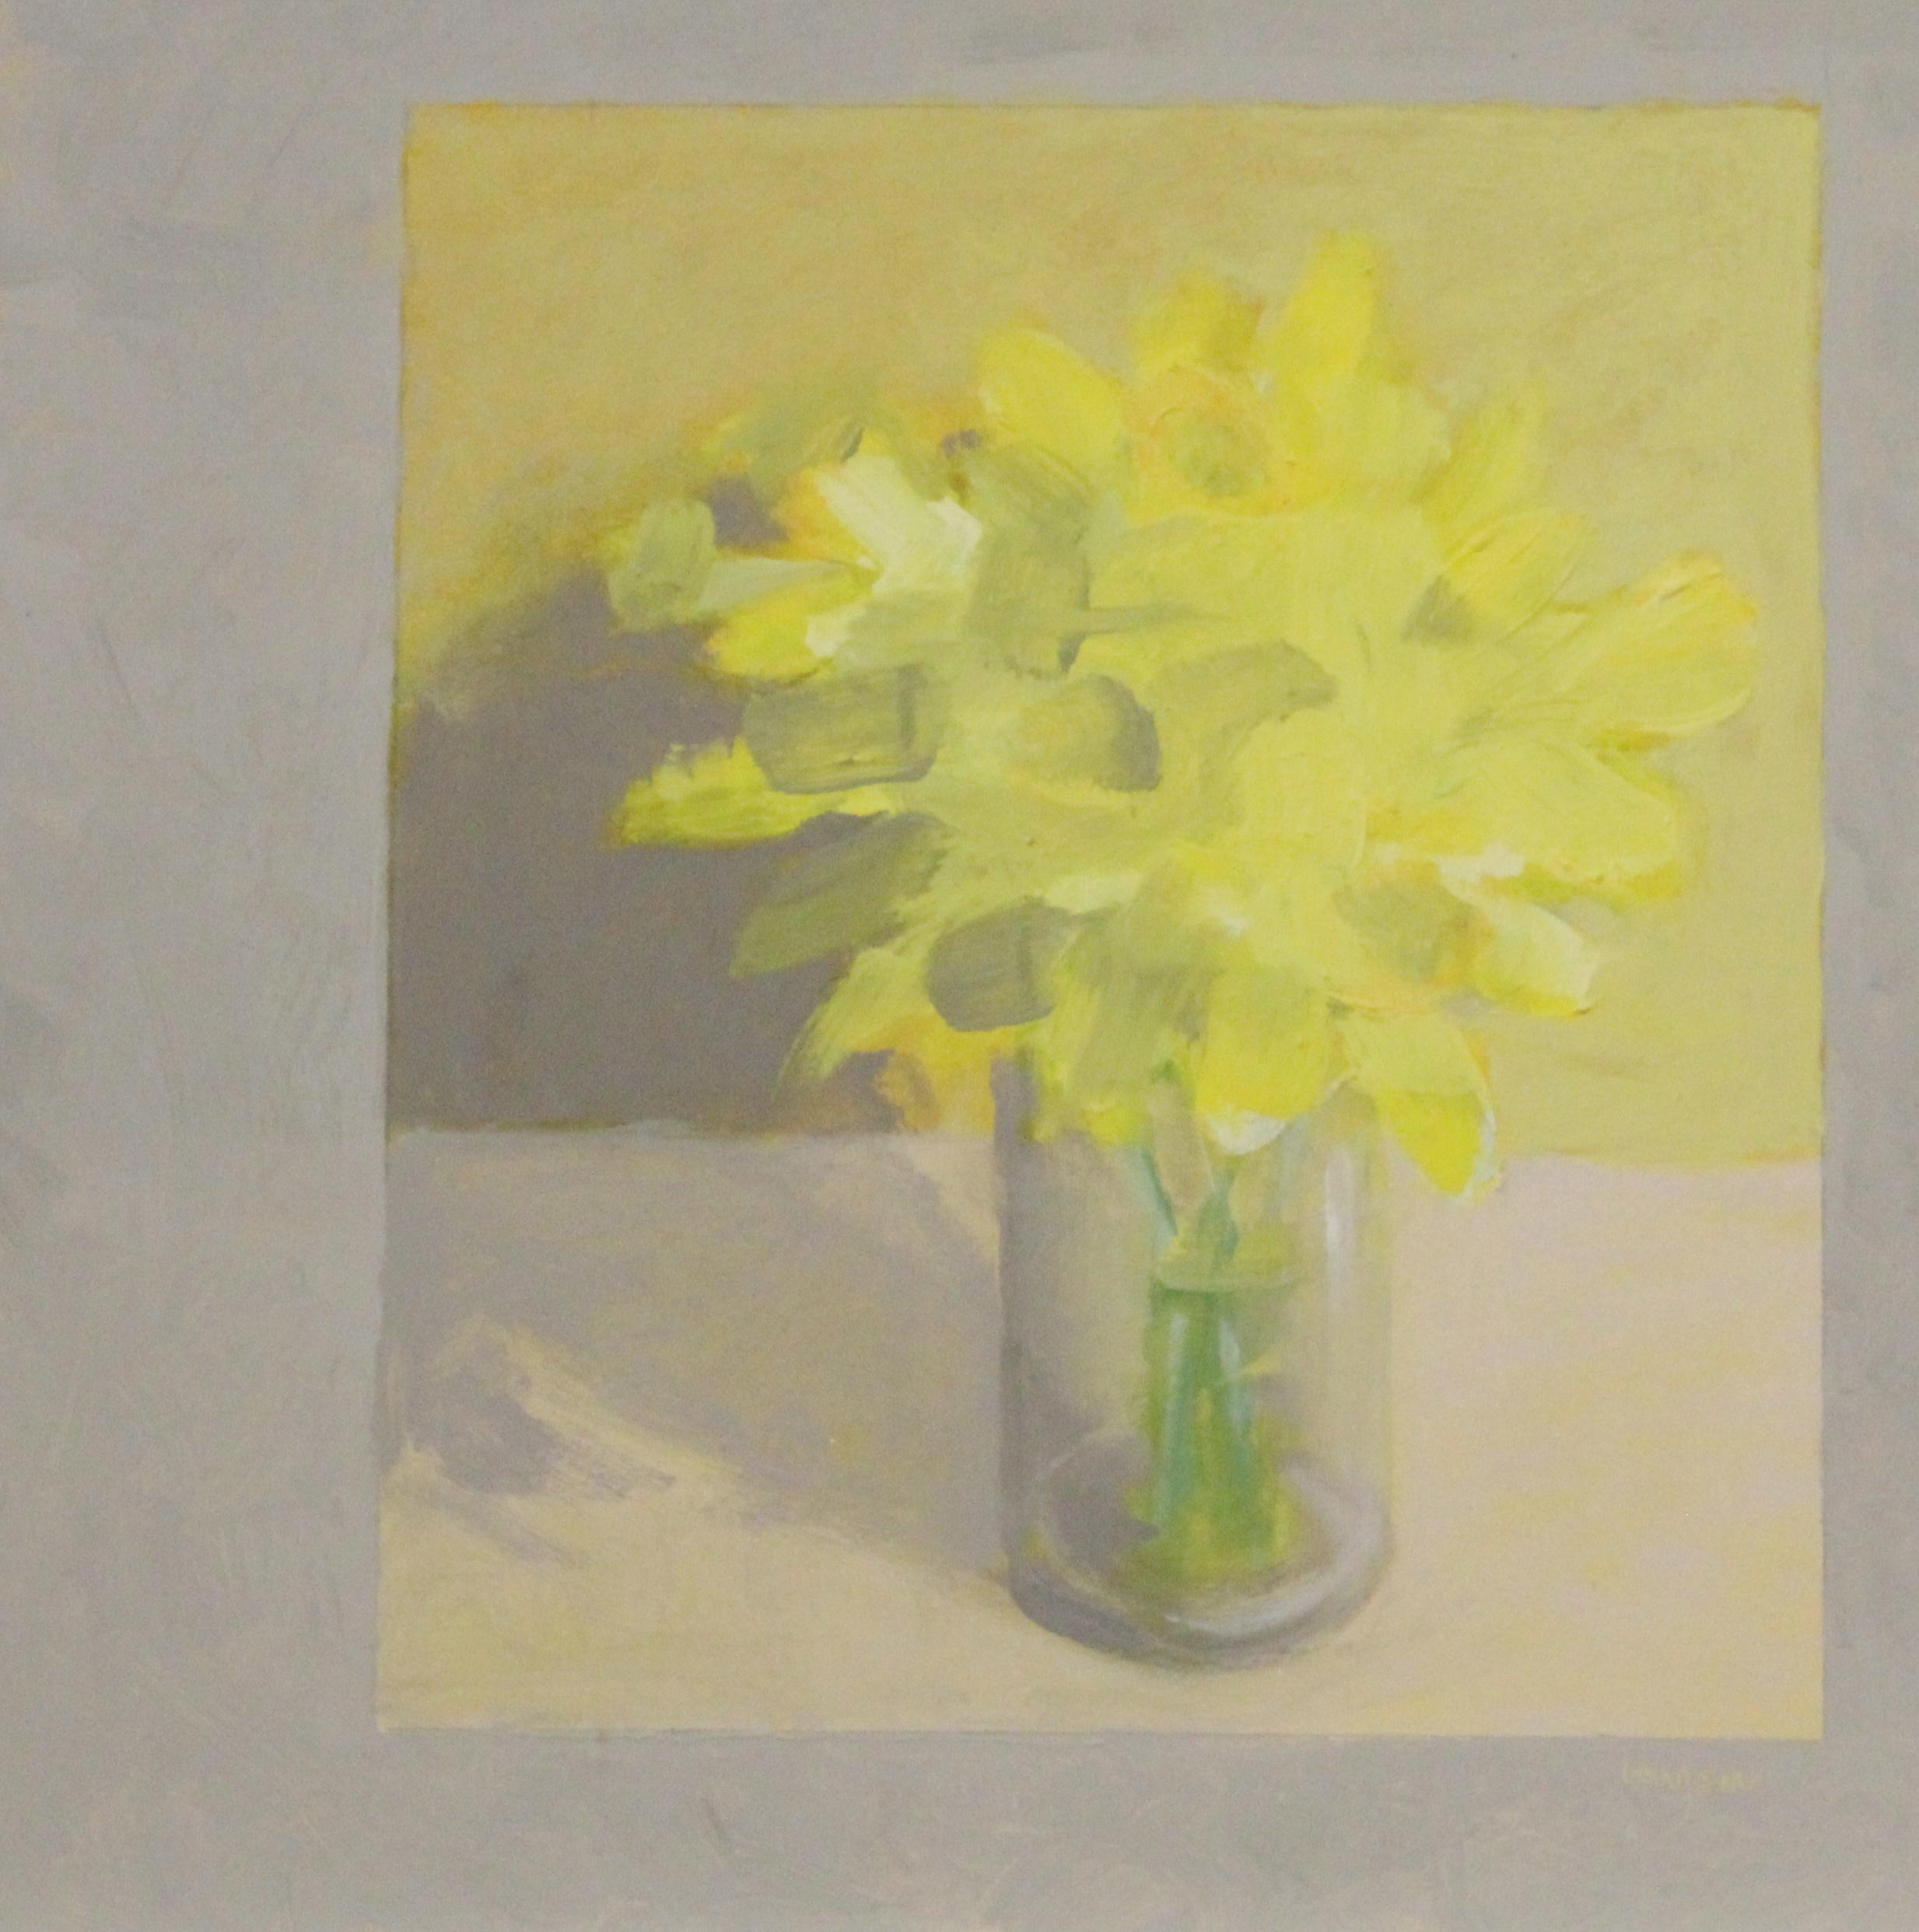 Flower #1 (Yellow Flower)- 12x12%22.JPG